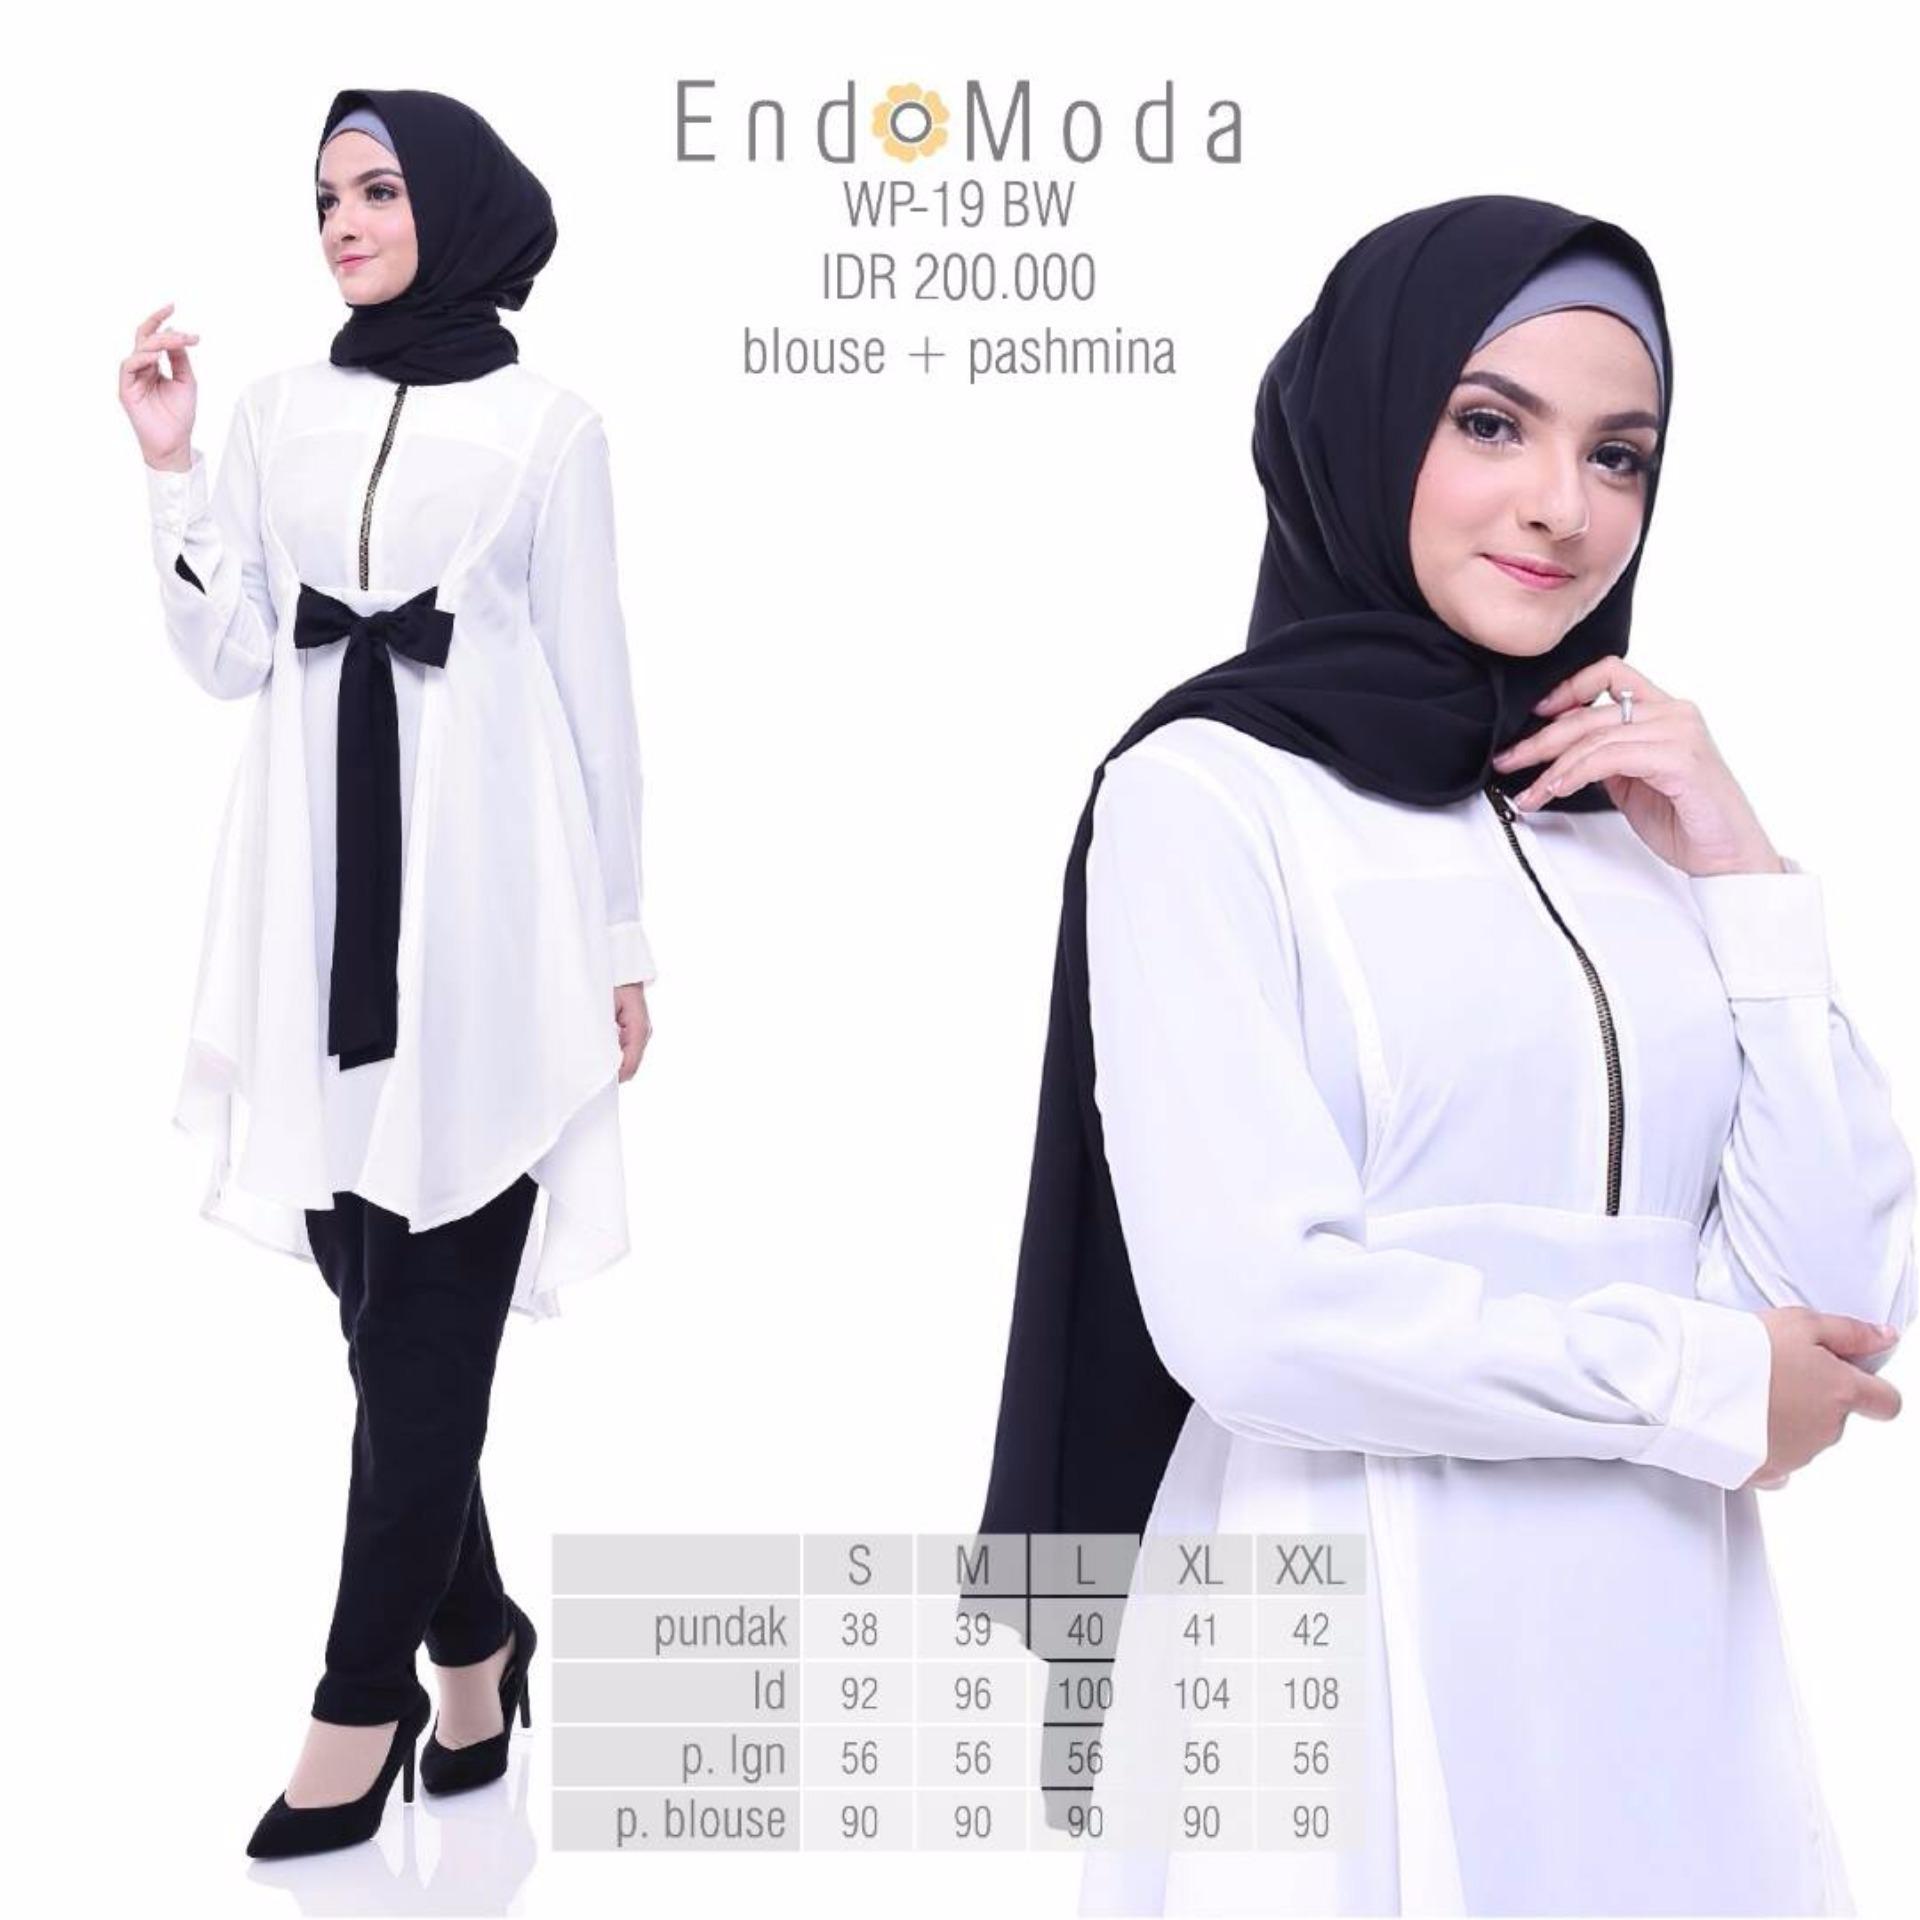 Baju Original Endo Moda Wp-19Blouse Wanita Baju Muslim Modern Gamis Katun  Supernova Premium WarnaBroken d3552167b0